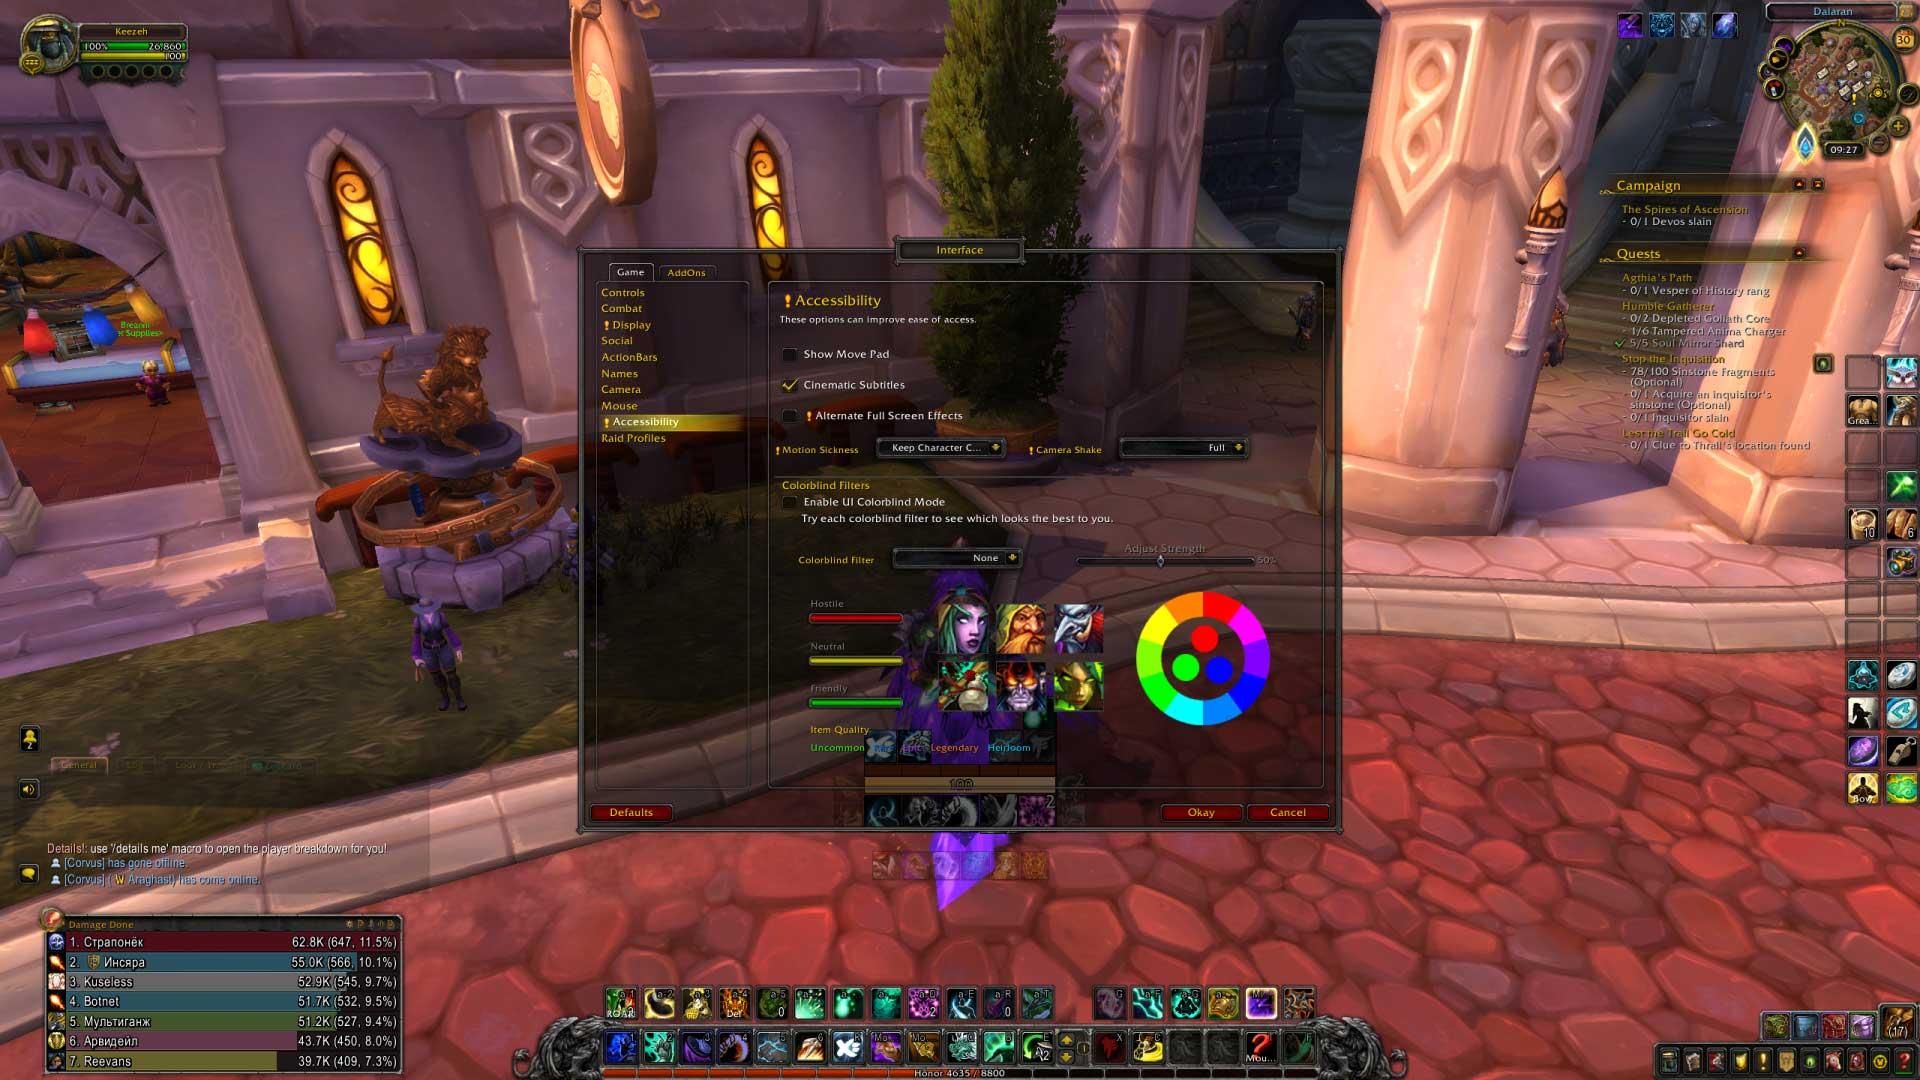 World-of-Warcraft-Ustawienia-interfejsu-6